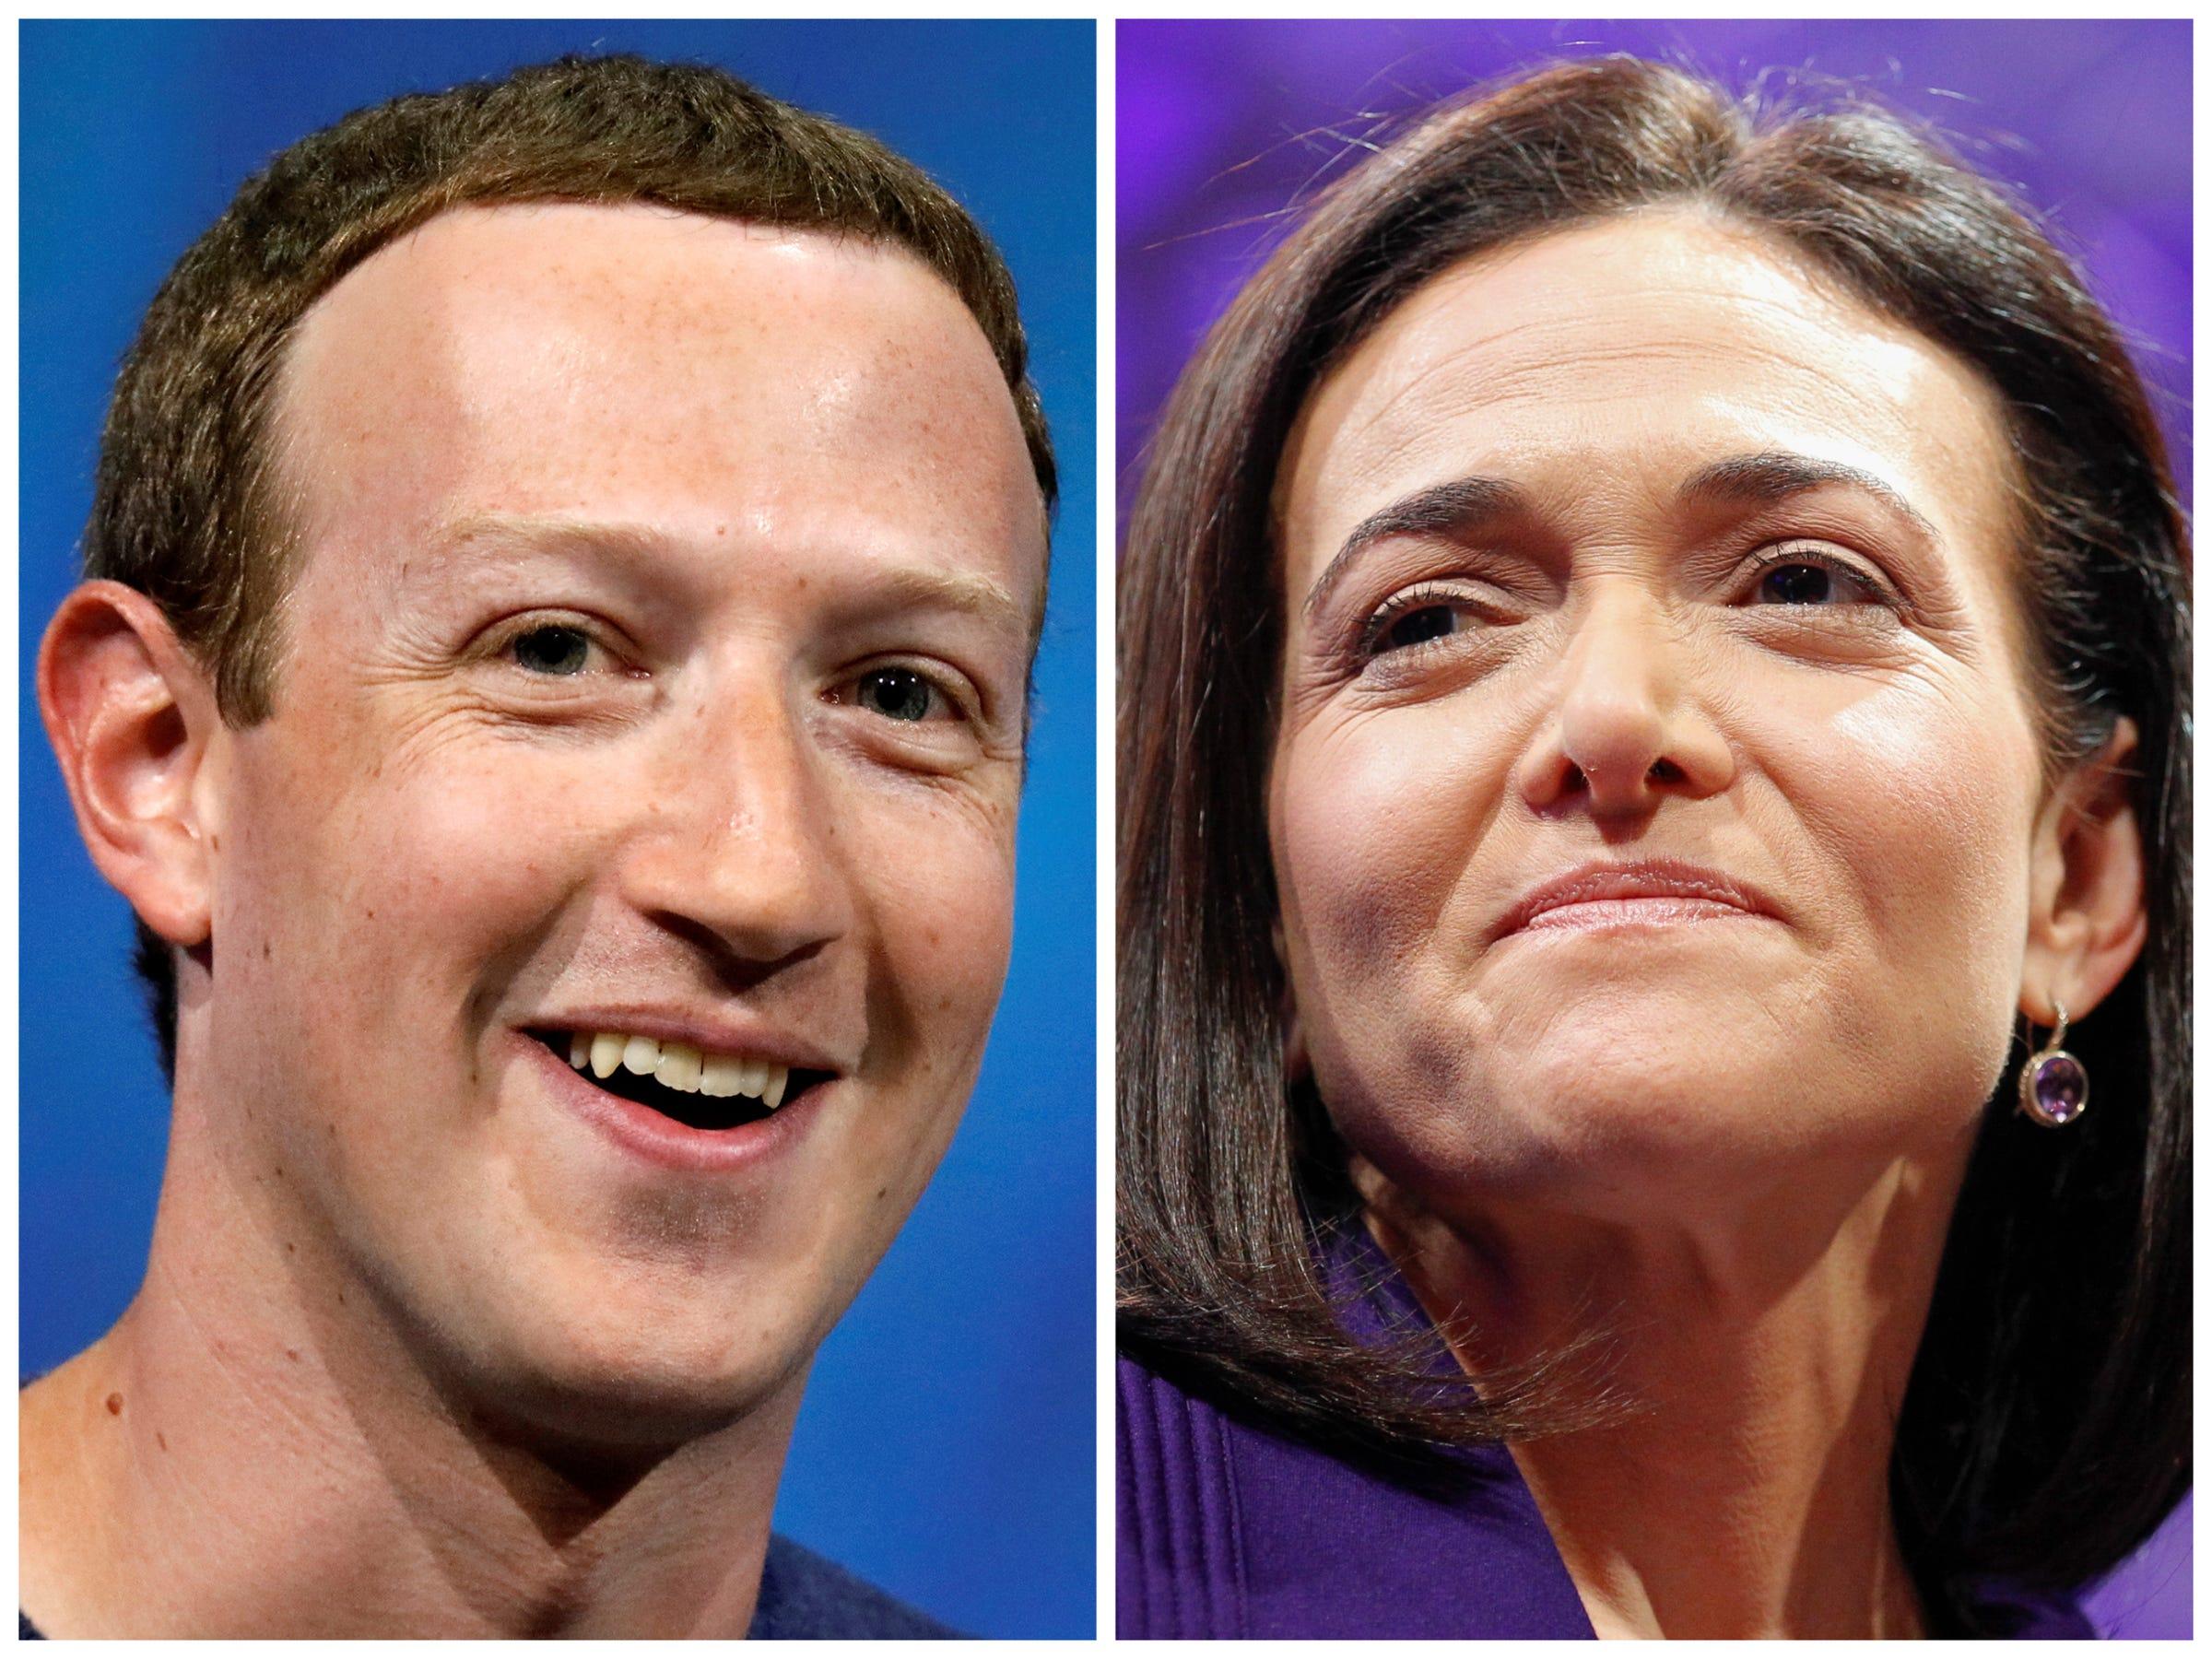 Mark Zuckerberg Sheryl Sandberg